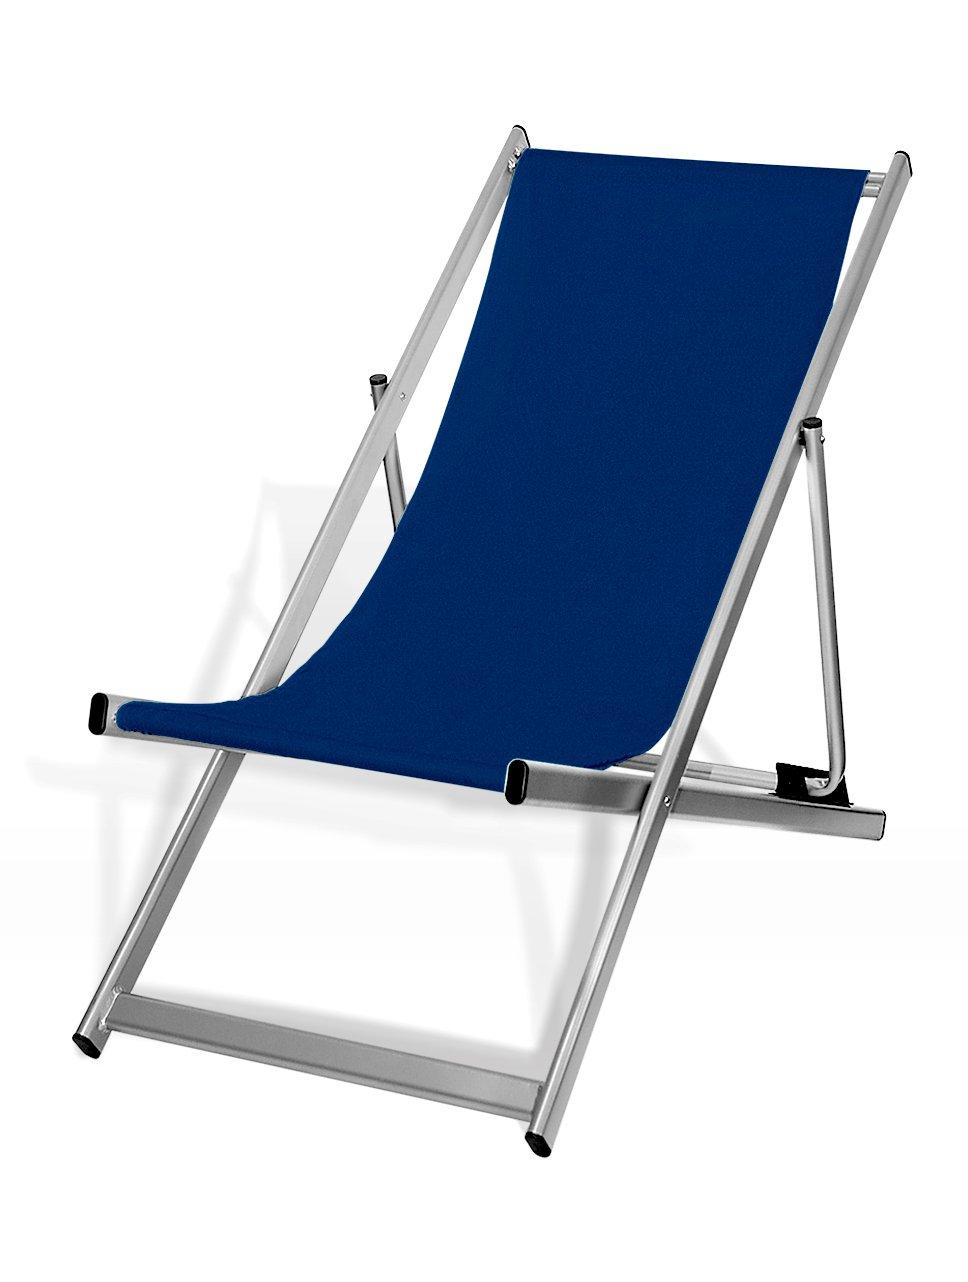 Liegestuhl, klappbar, Aluminium, Sitzbezug Dunkelblau, silber ...